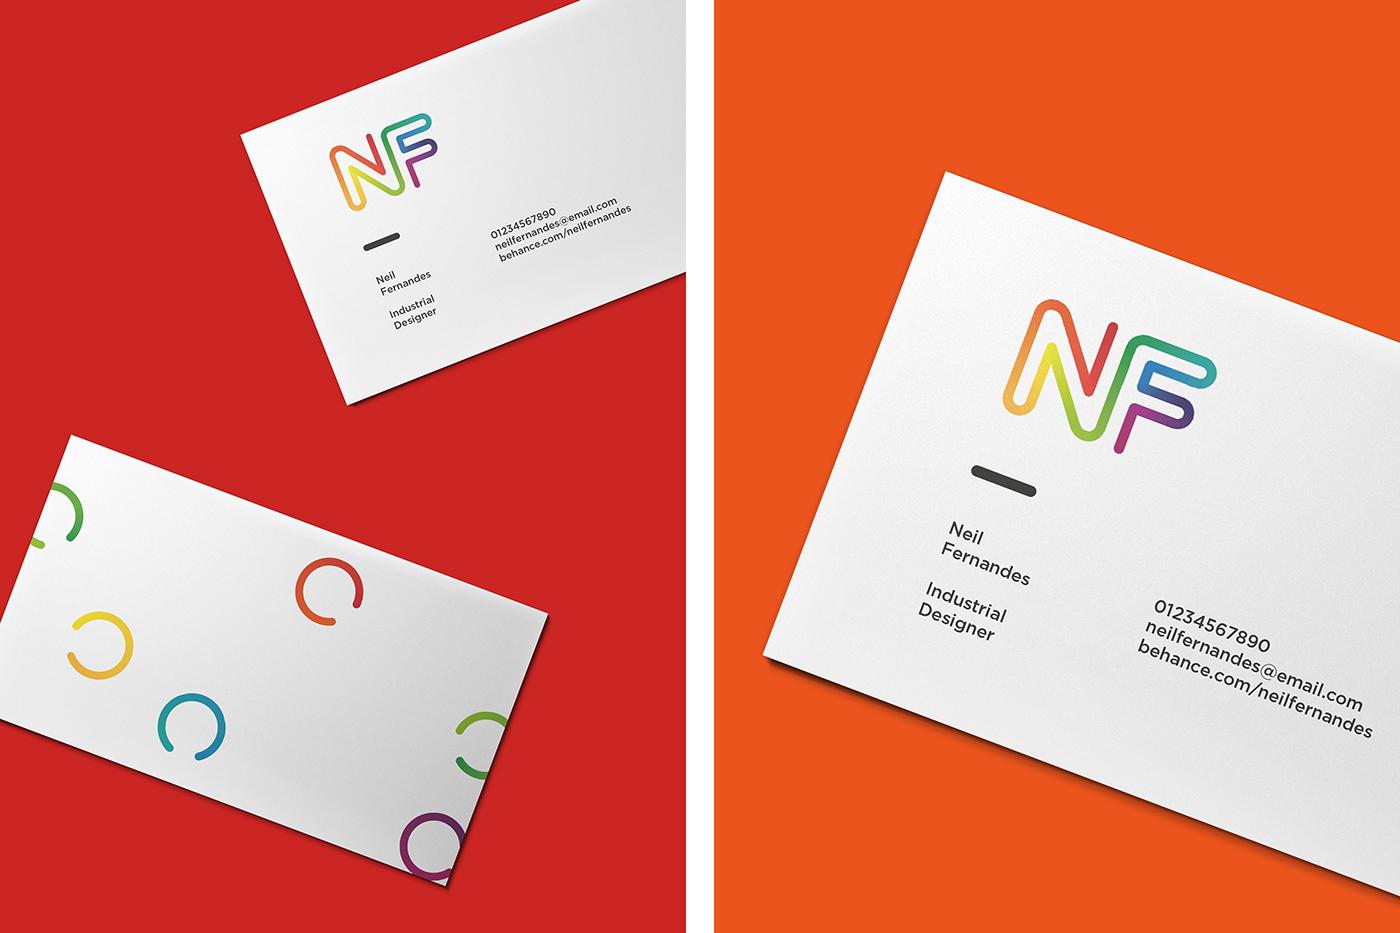 industrial designer designer identity self identity Self Promotion Self employed Stationery business card logo letterhead invoice Animated Logo